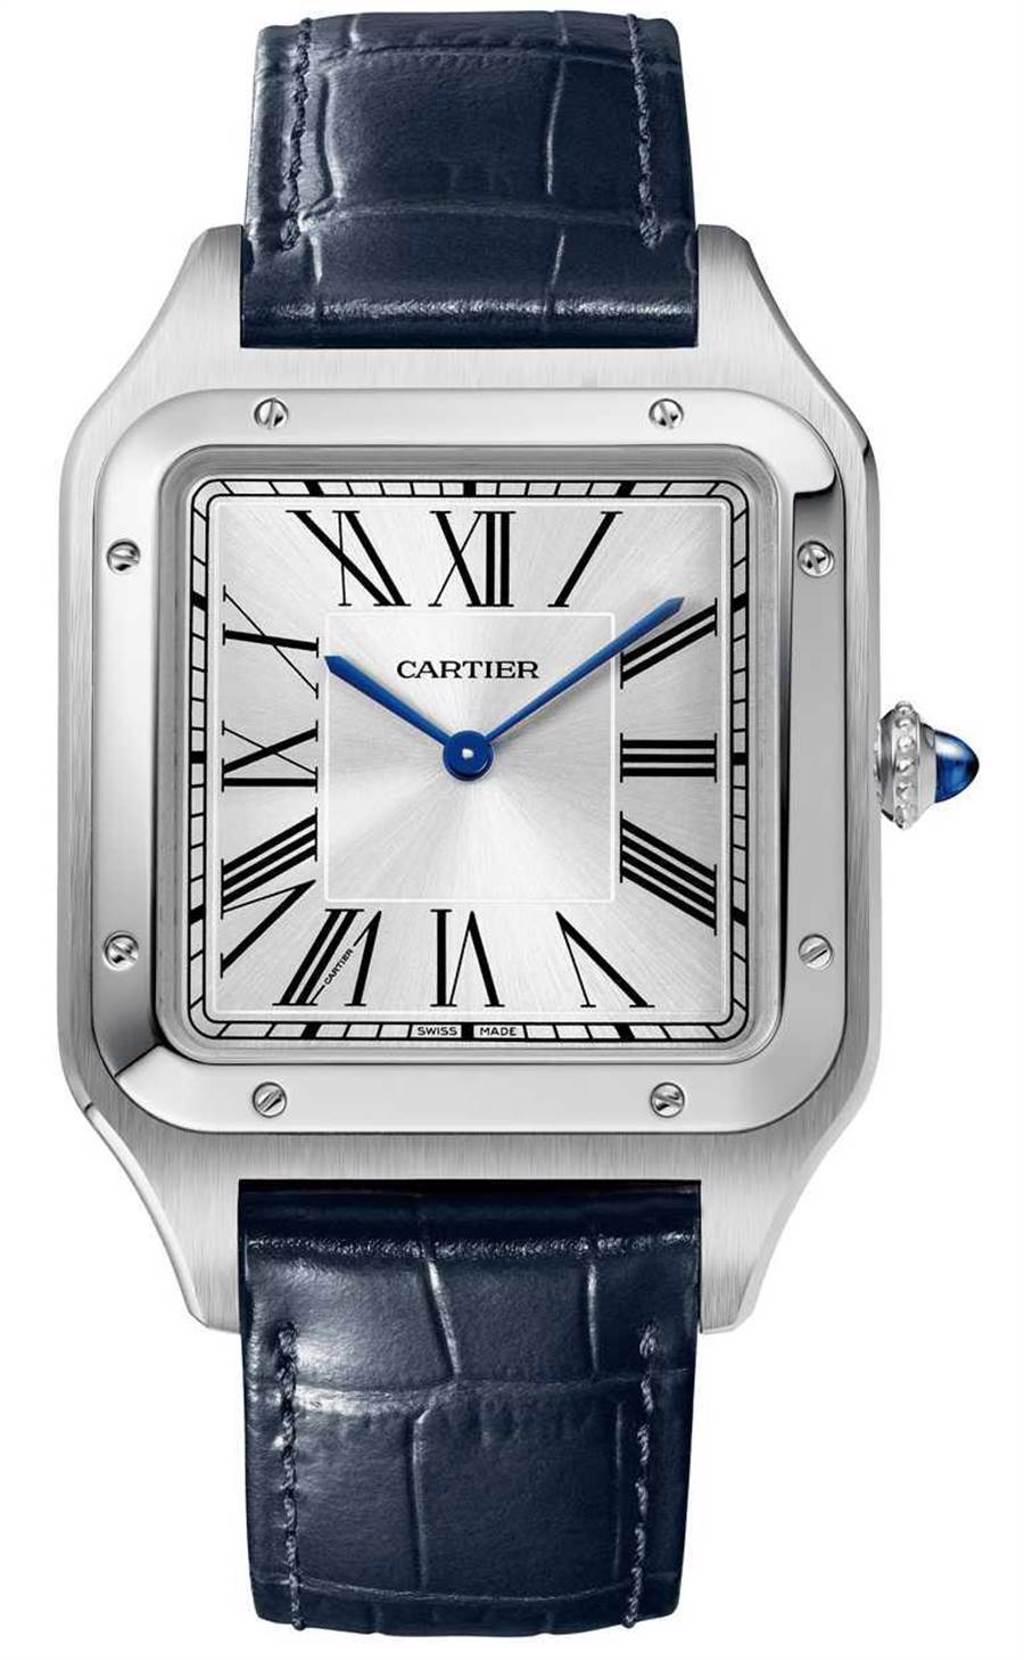 CARTIER「Santos-Dumont系列」超大型款腕錶,精鋼錶殼,46.6mm╱180,000元。(圖╱CARTIER提供)